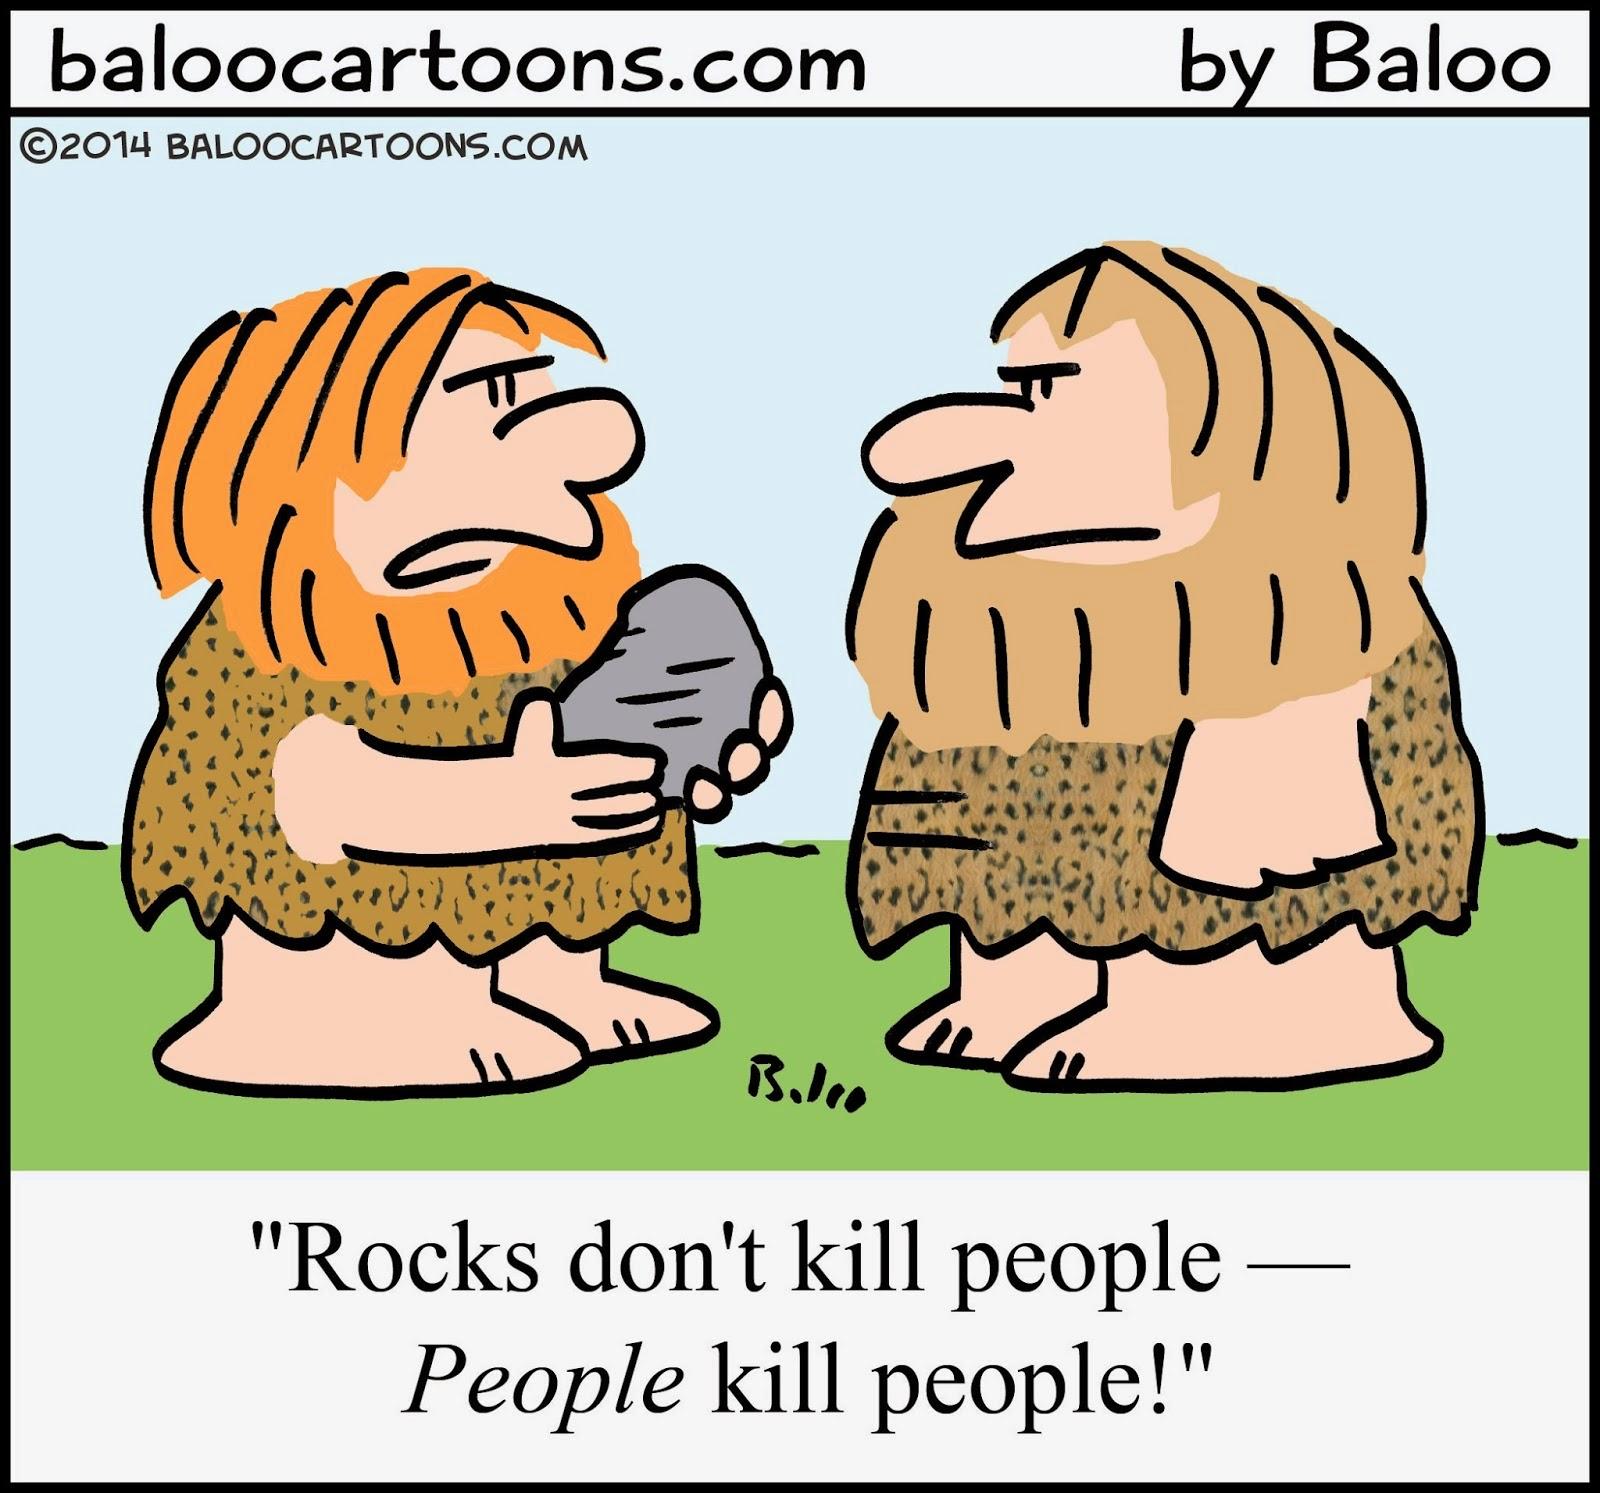 Caveman Cartoon Show : Caveman cartoon show images